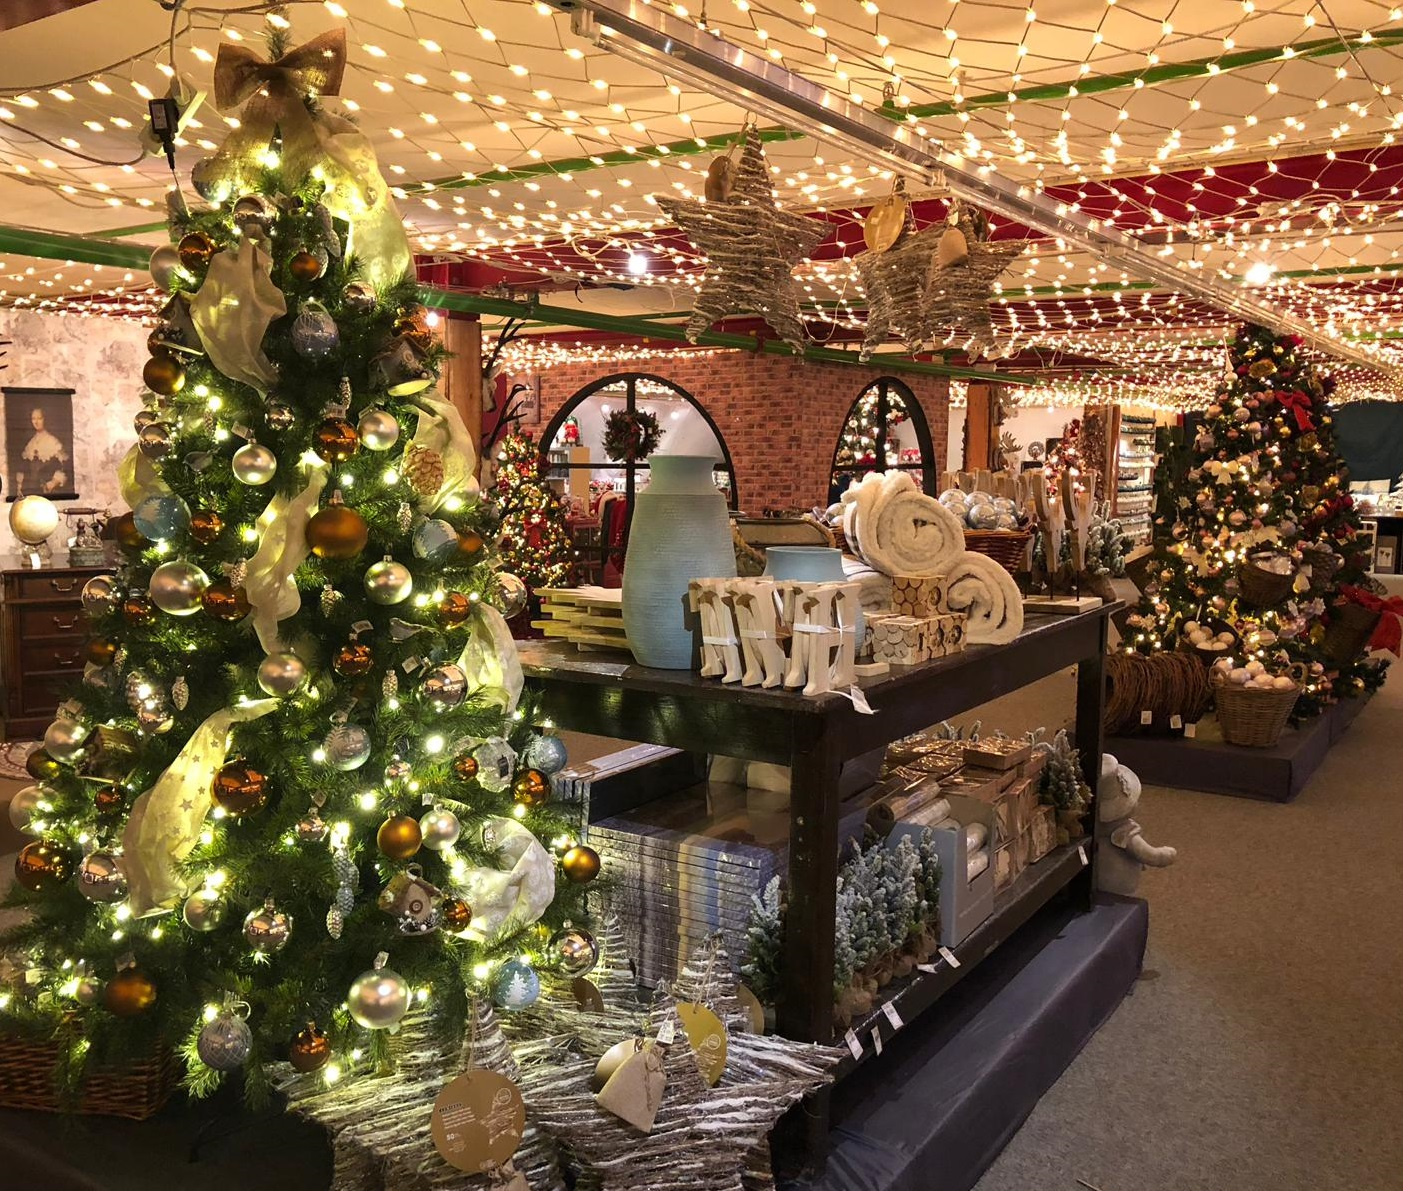 Kerstshow Kerstwereld Hendriks 2018: knus kerstshoppen